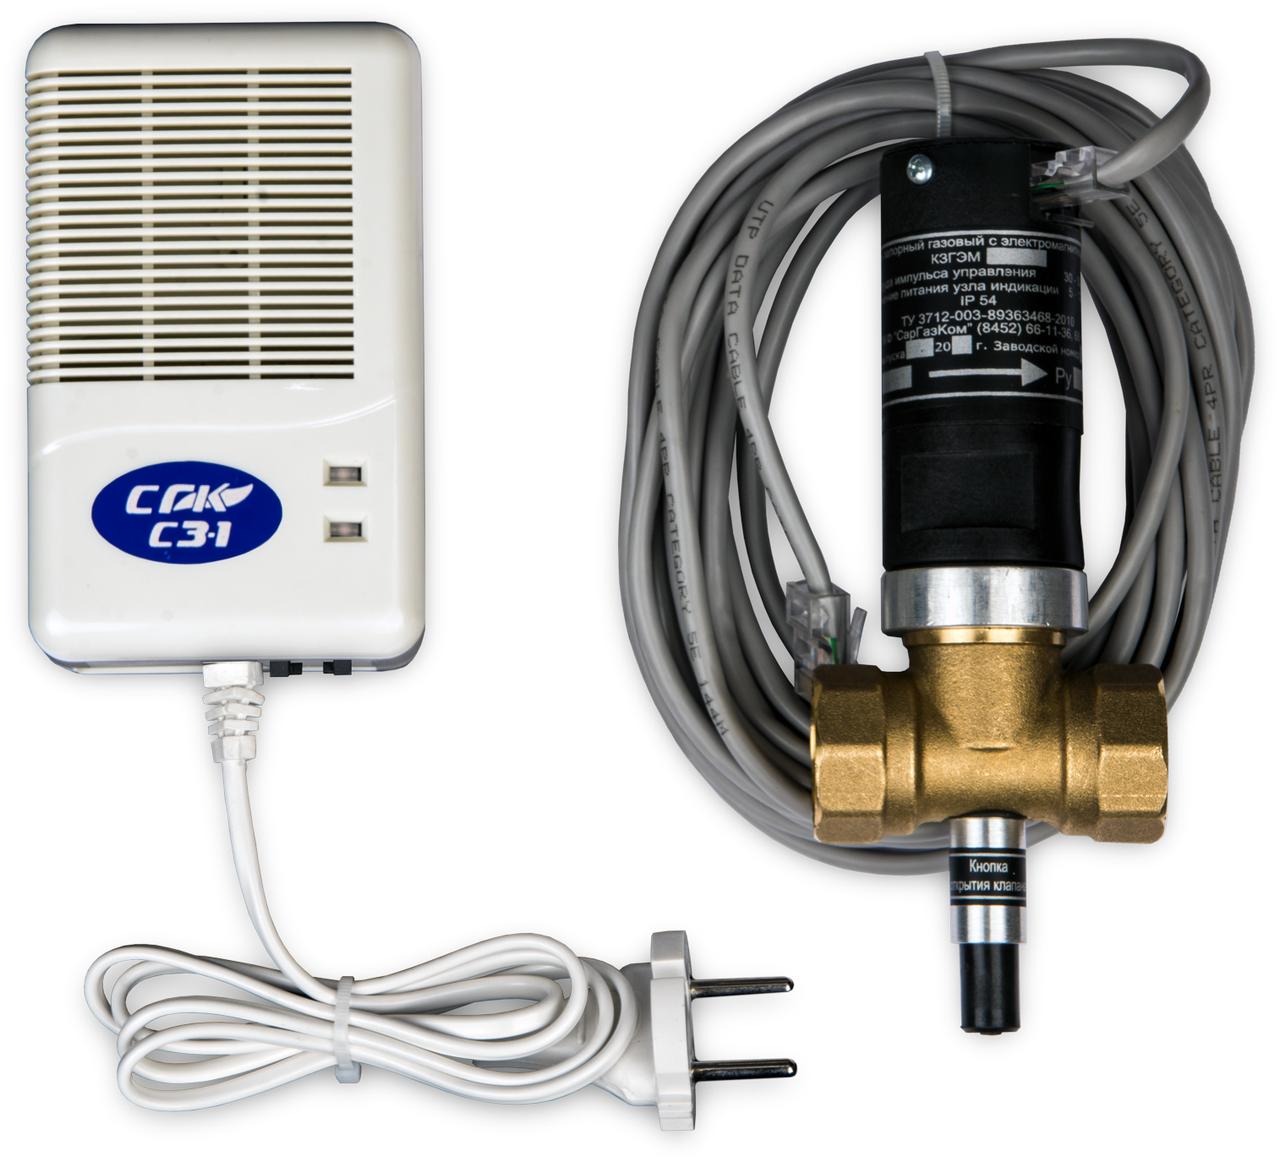 Система автономного контроля загазованности СГК-1-СН4 DN50 НД